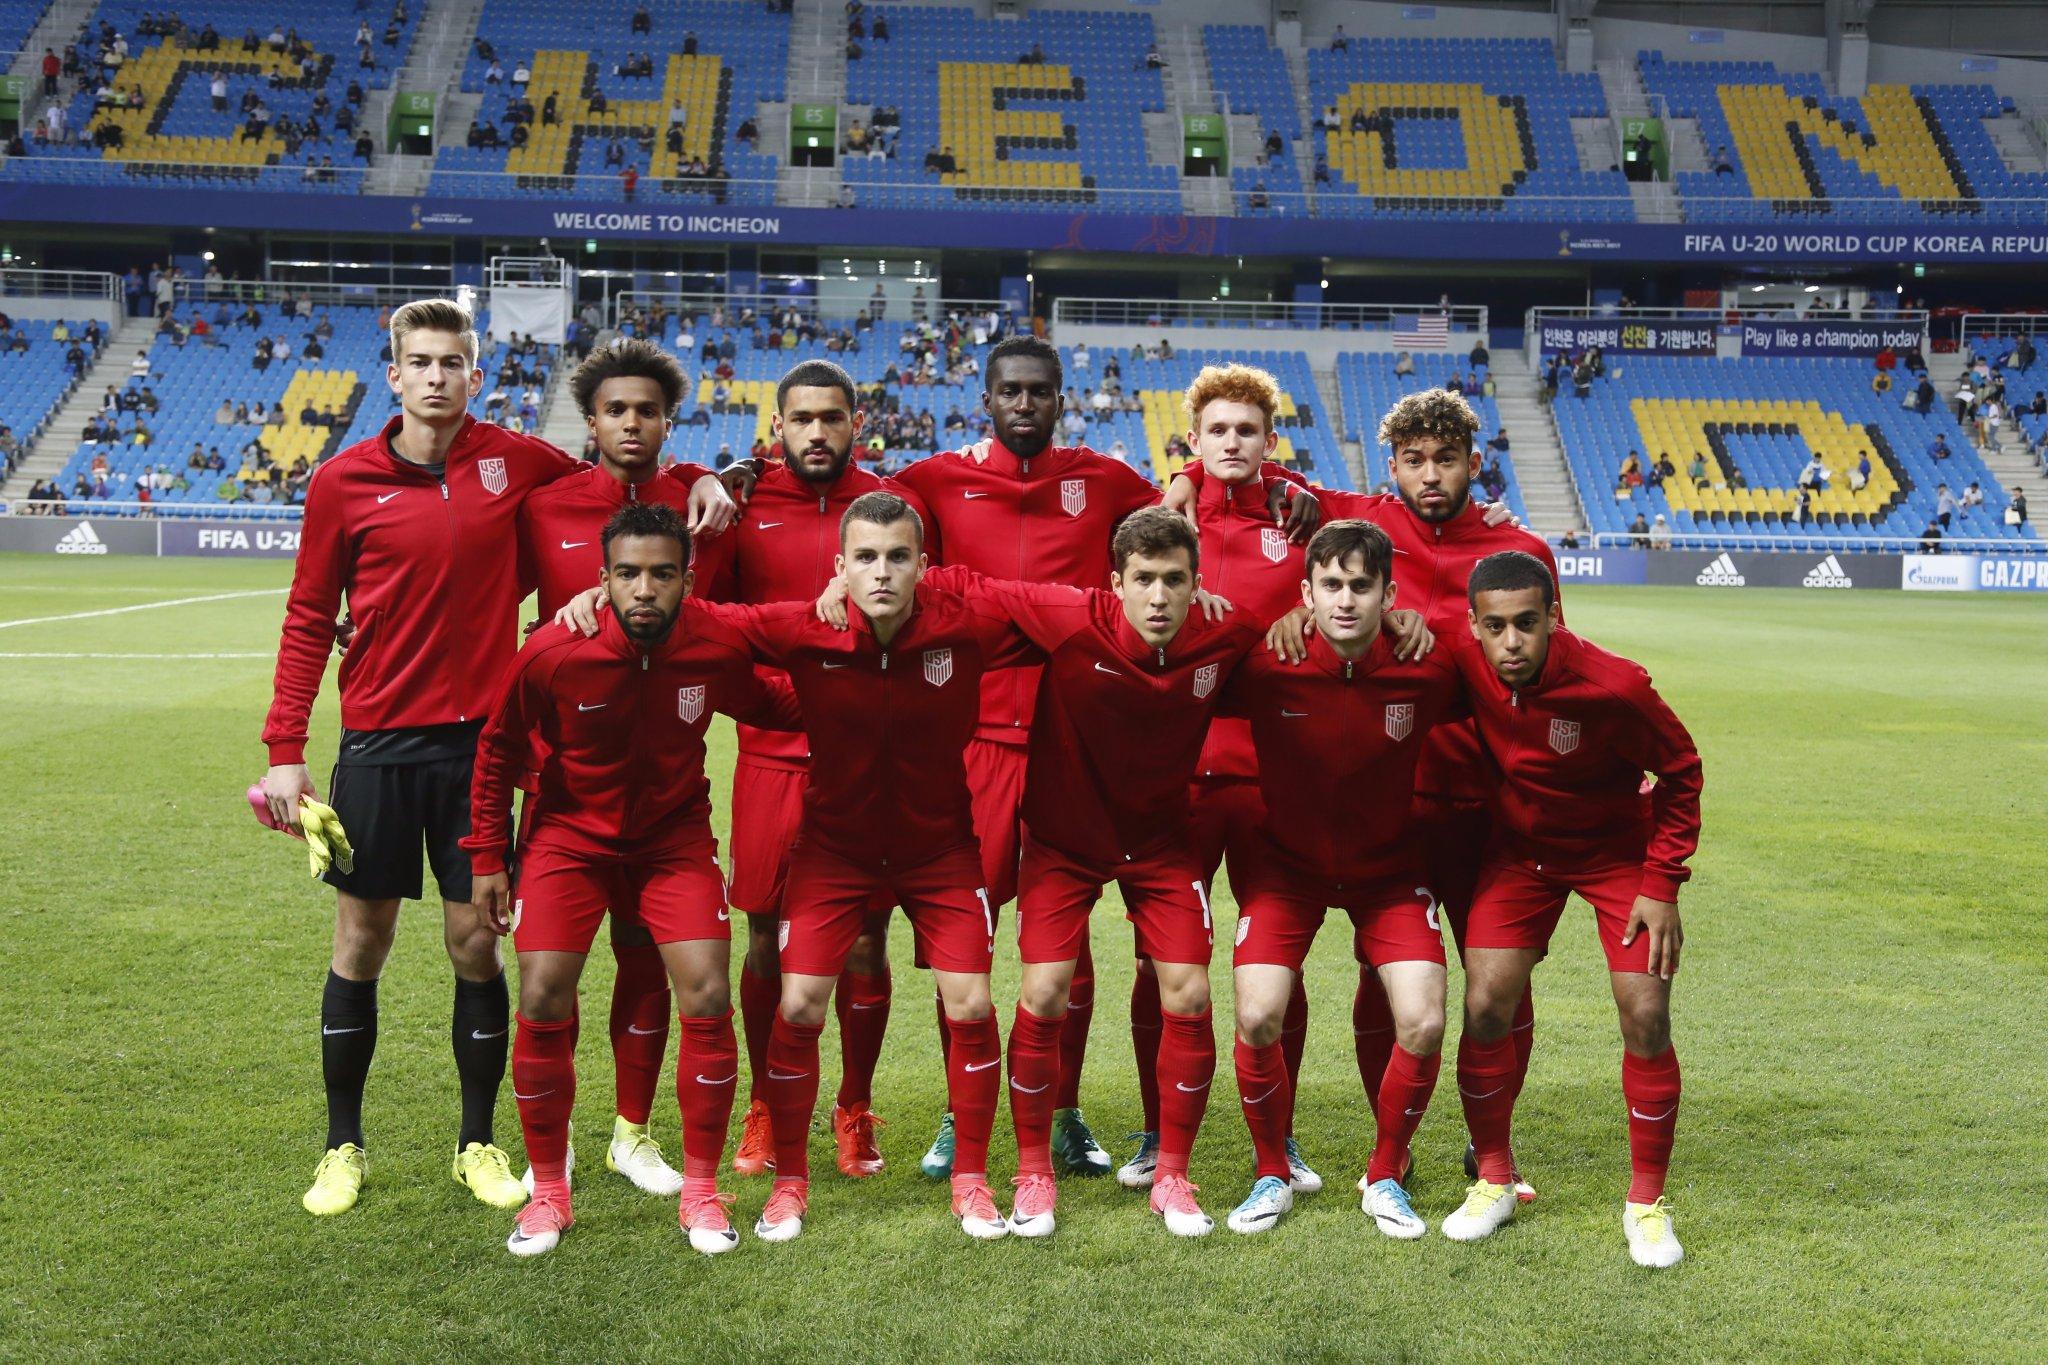 U.S. U-20 Defeat Senegal 1-0; Now Lead Group F